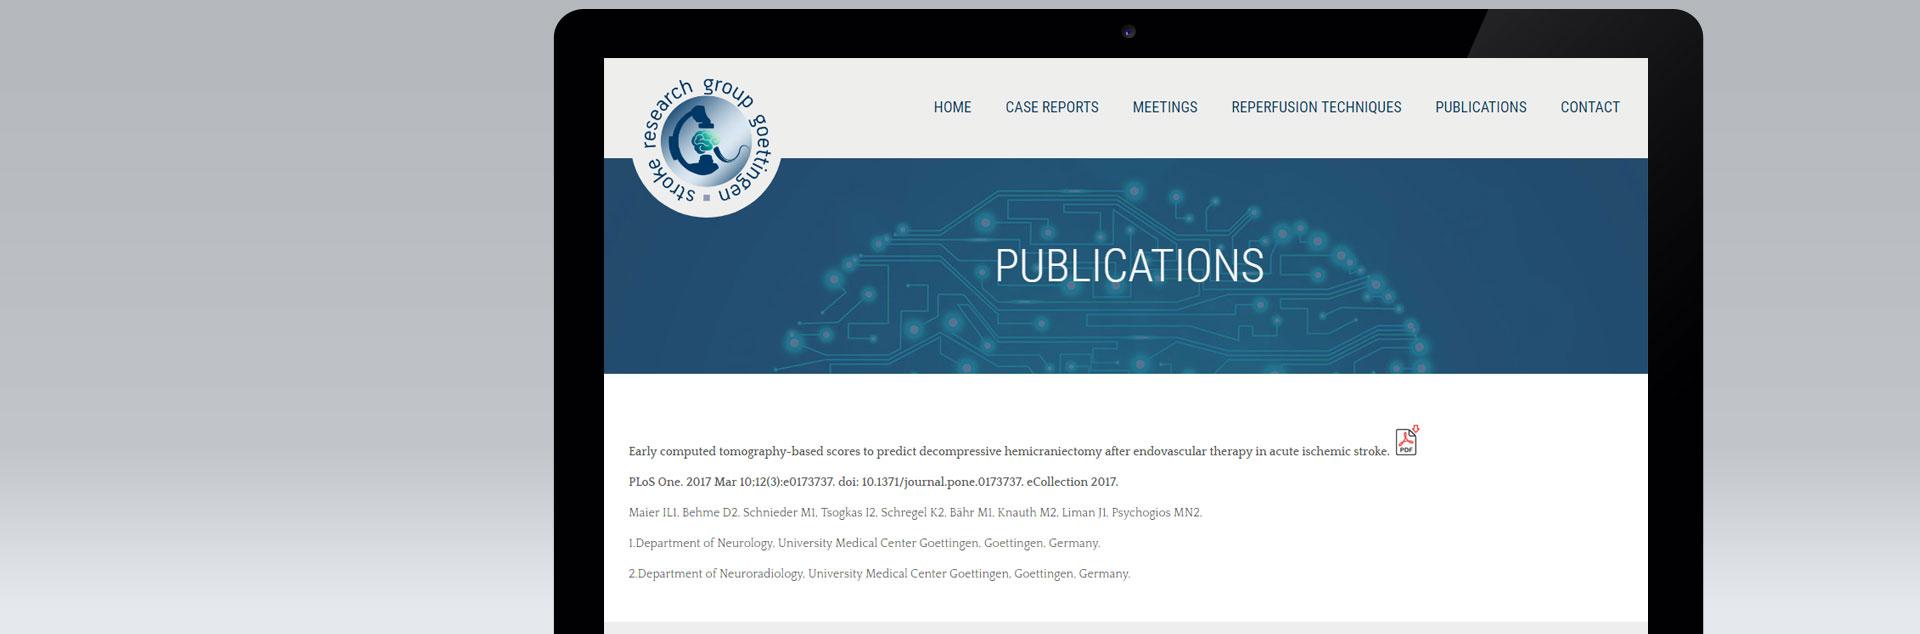 onestop-slider-publications